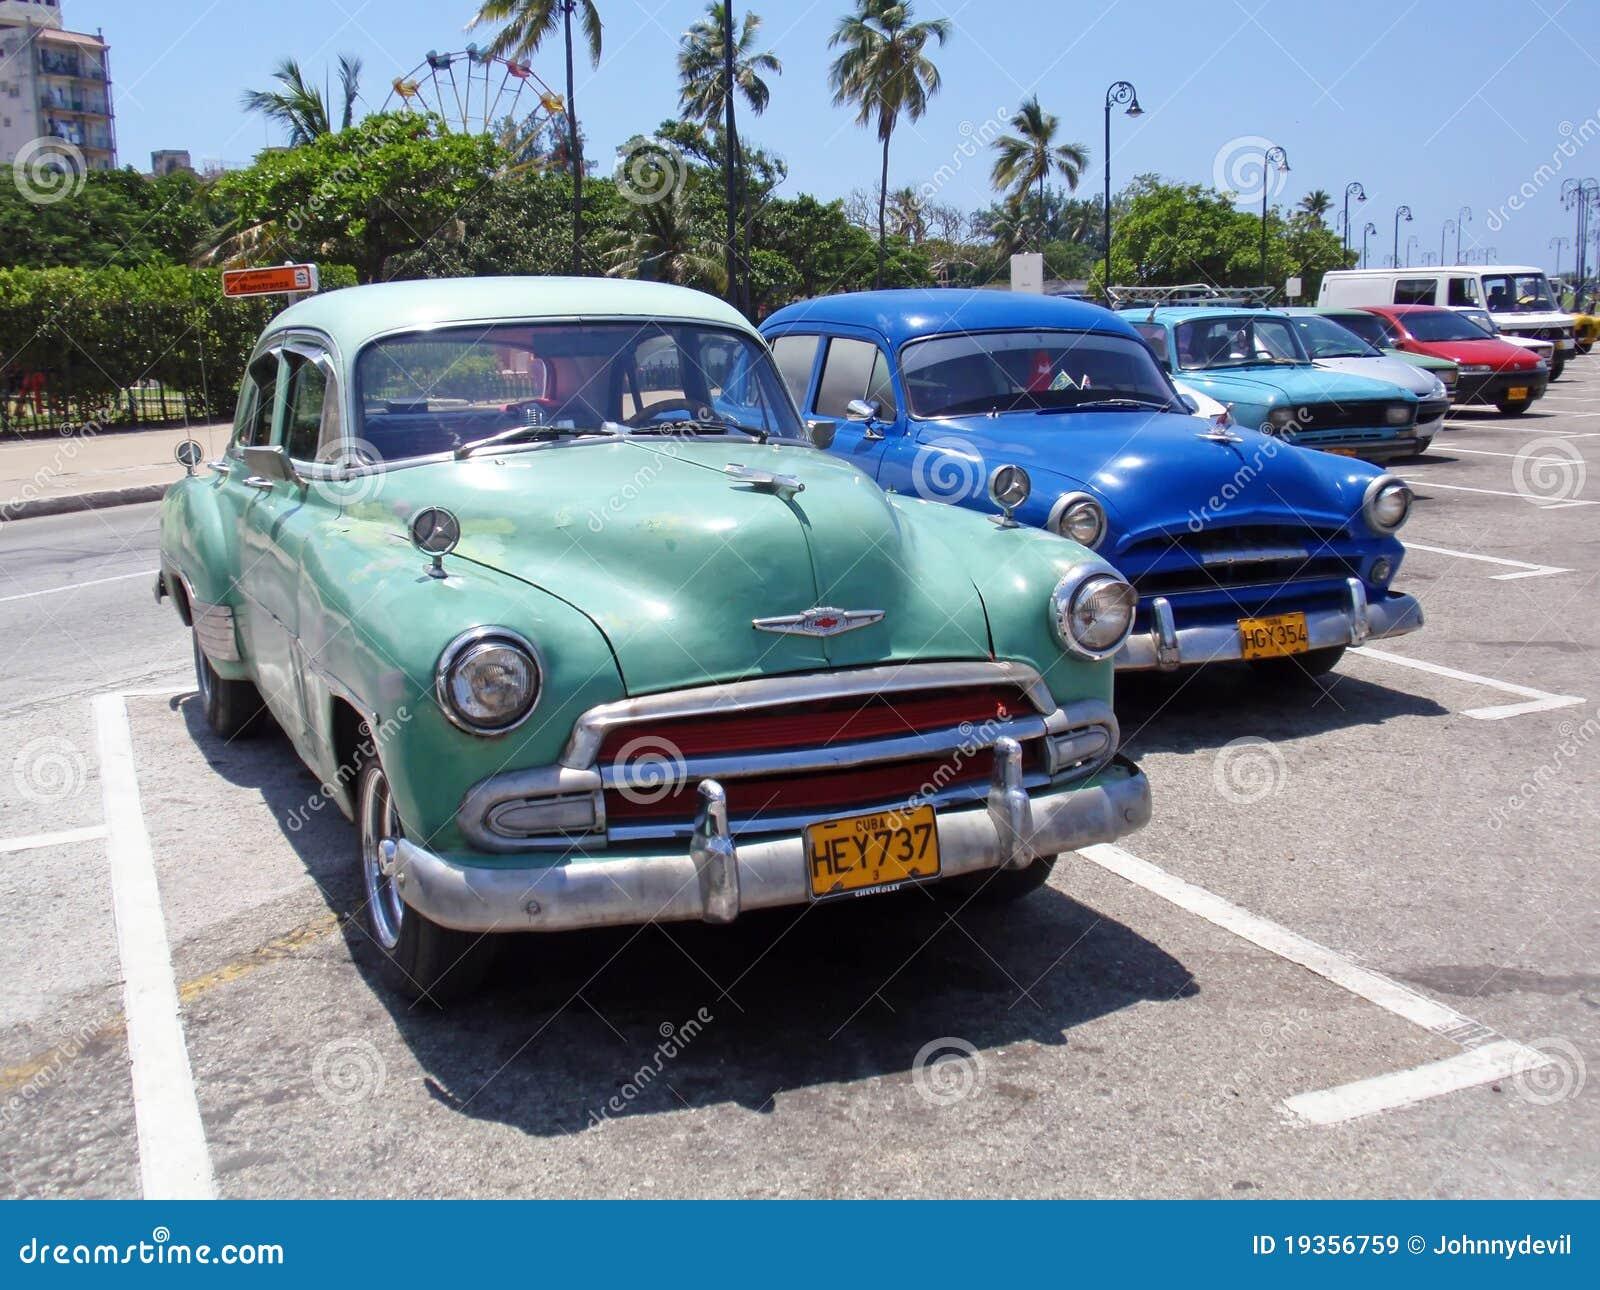 Carros coloridos em Havana, Cuba